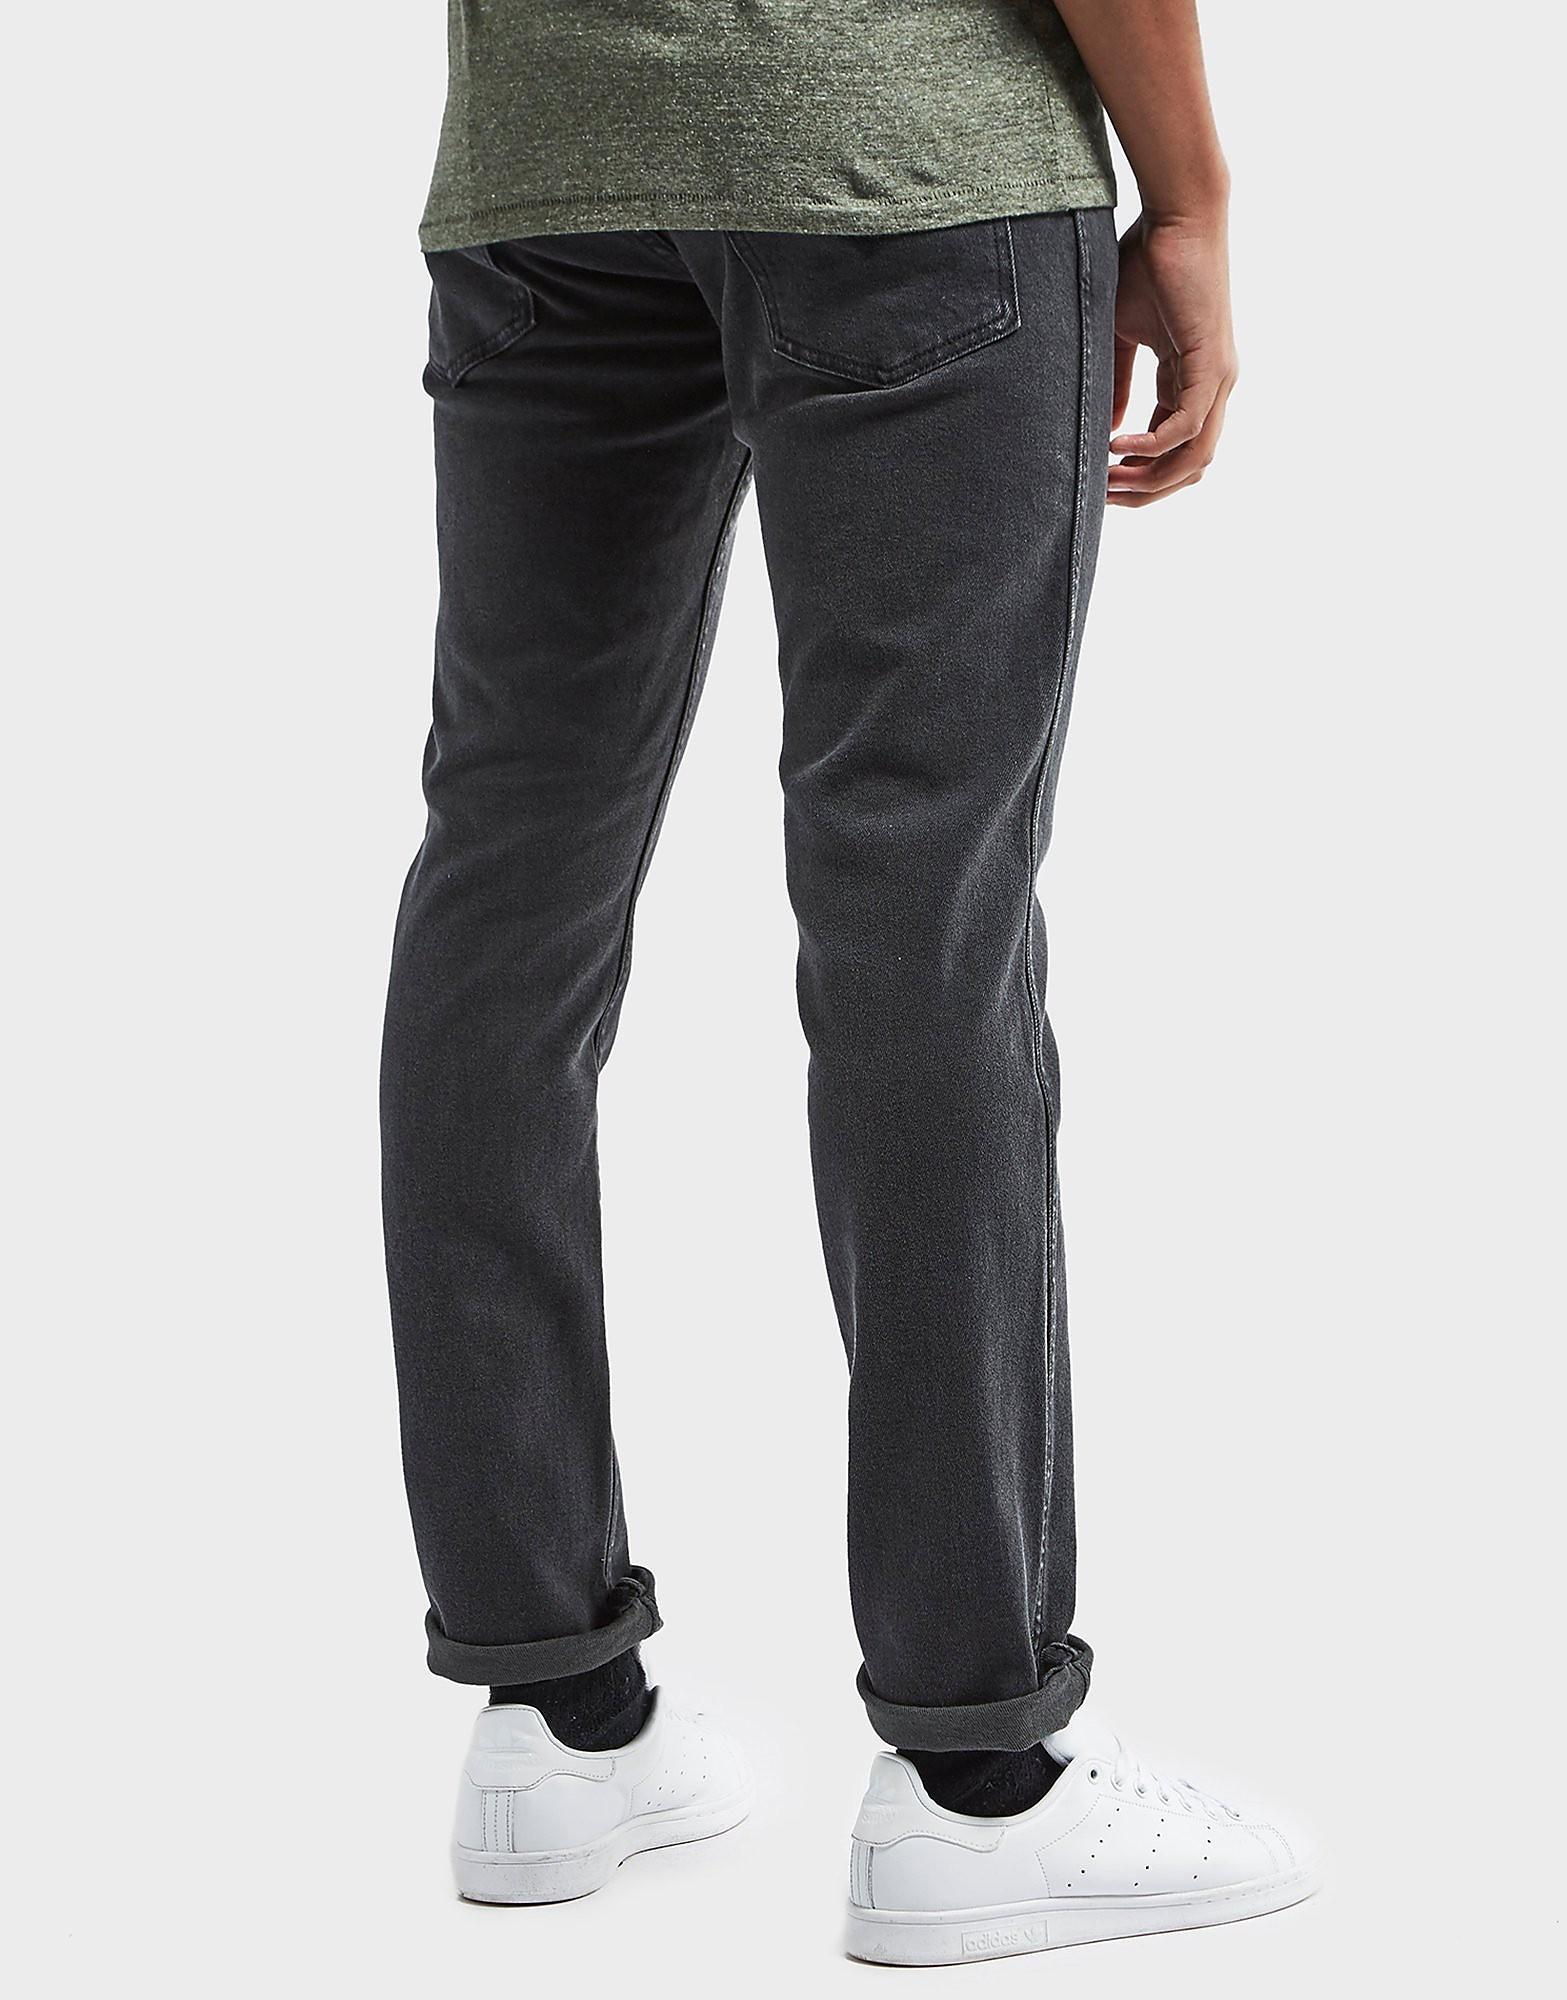 Levis Slim Straight Jeans